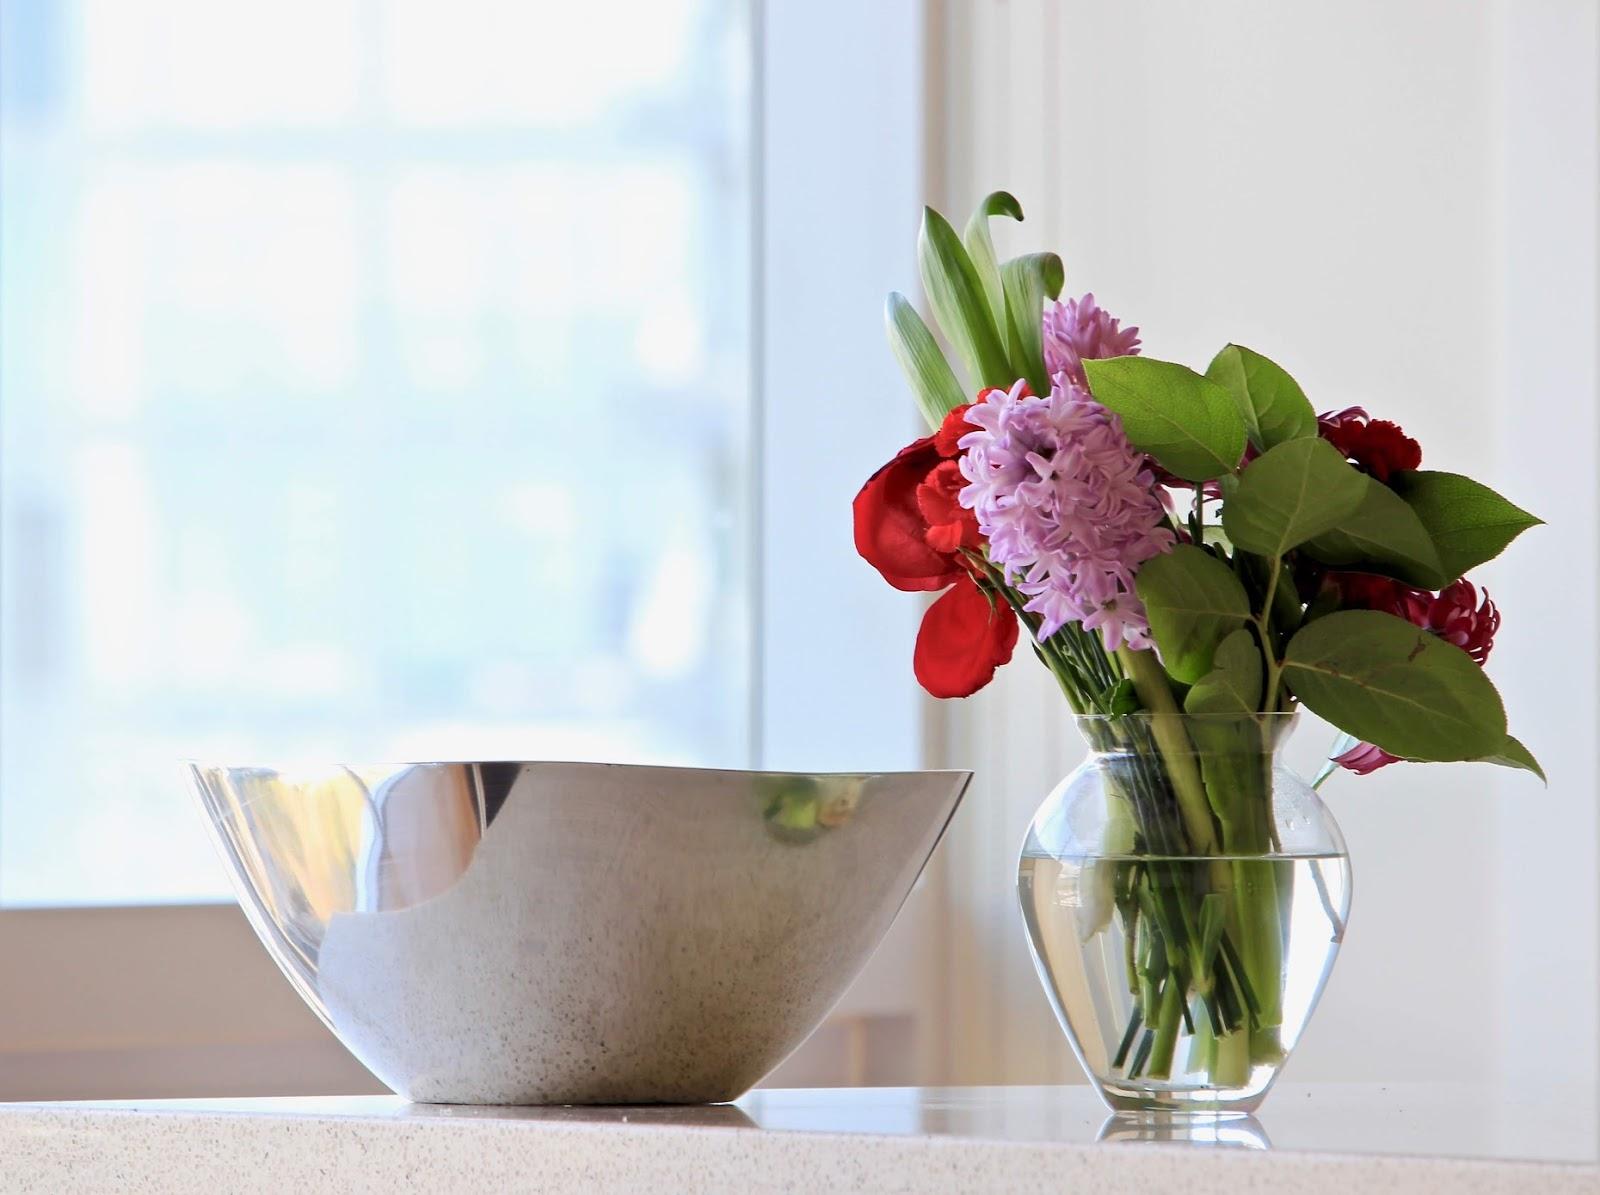 airbnb amenities inspiration design flowers greenery fresh inspiring